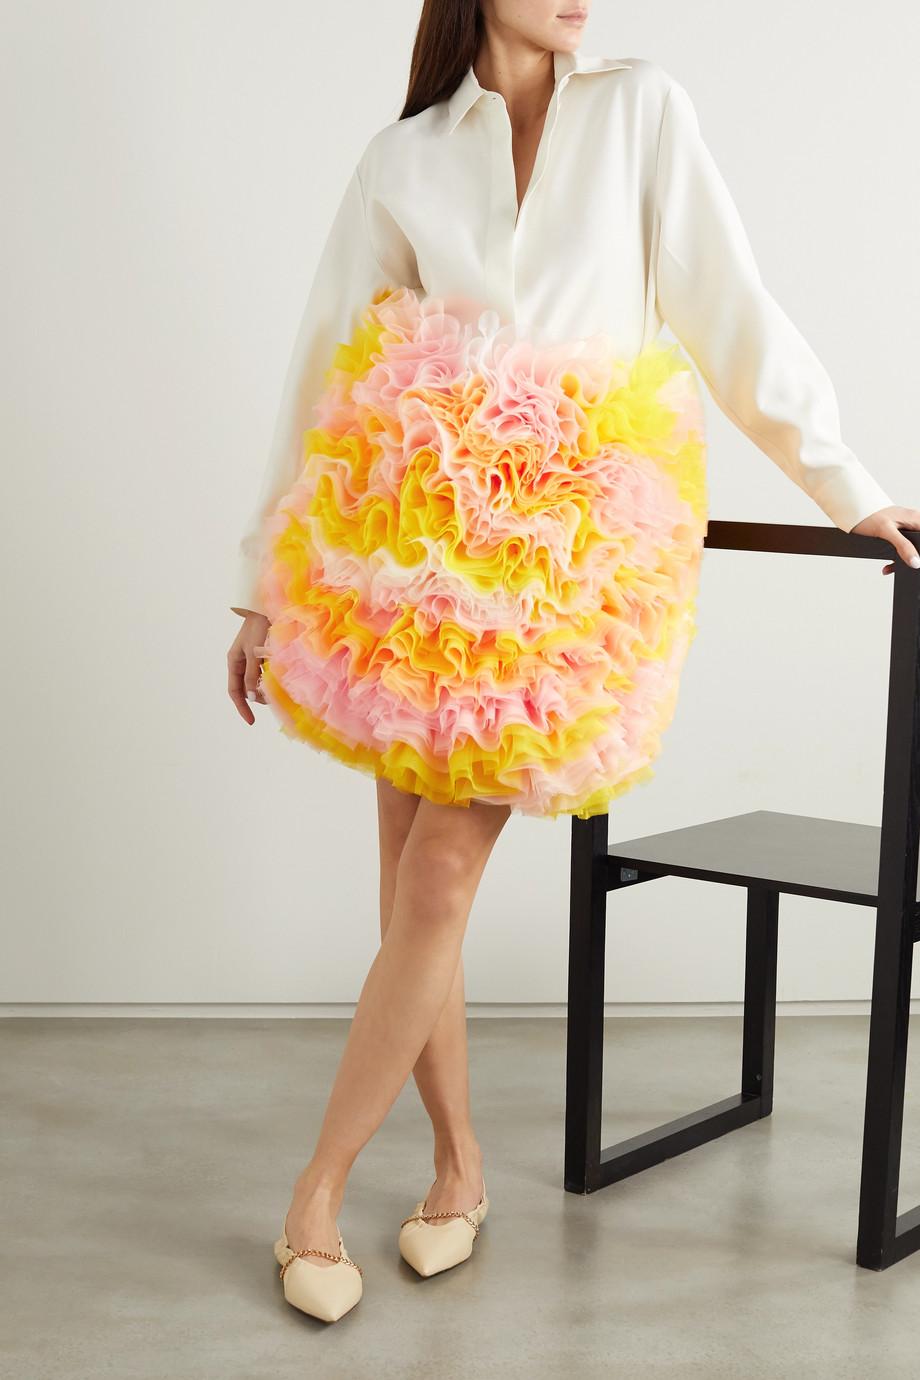 Tomo Koizumi X Emilio Pucci Ruffled tulle skirt